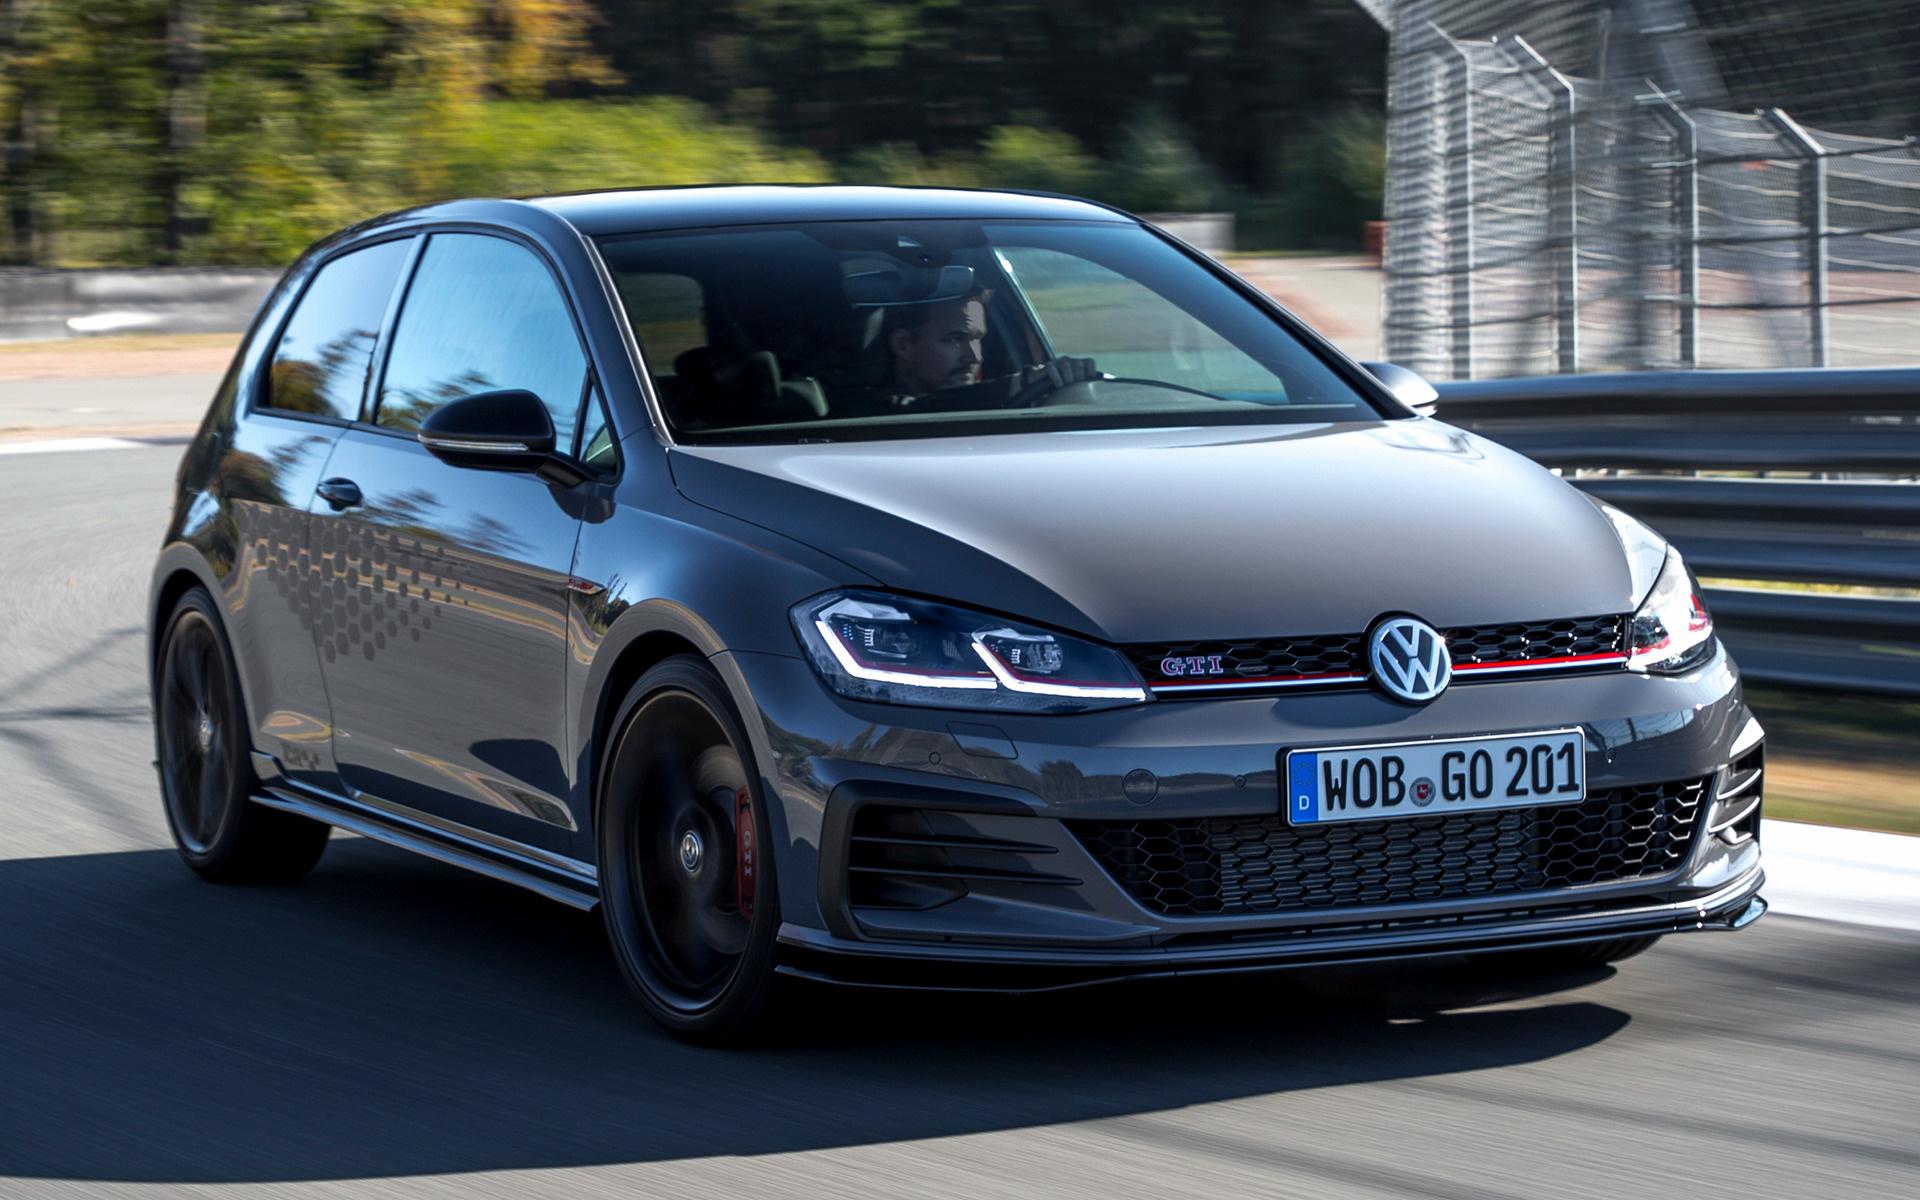 2019 Volkswagen Golf Gti Tcr 3 Door Fondos De Pantalla E